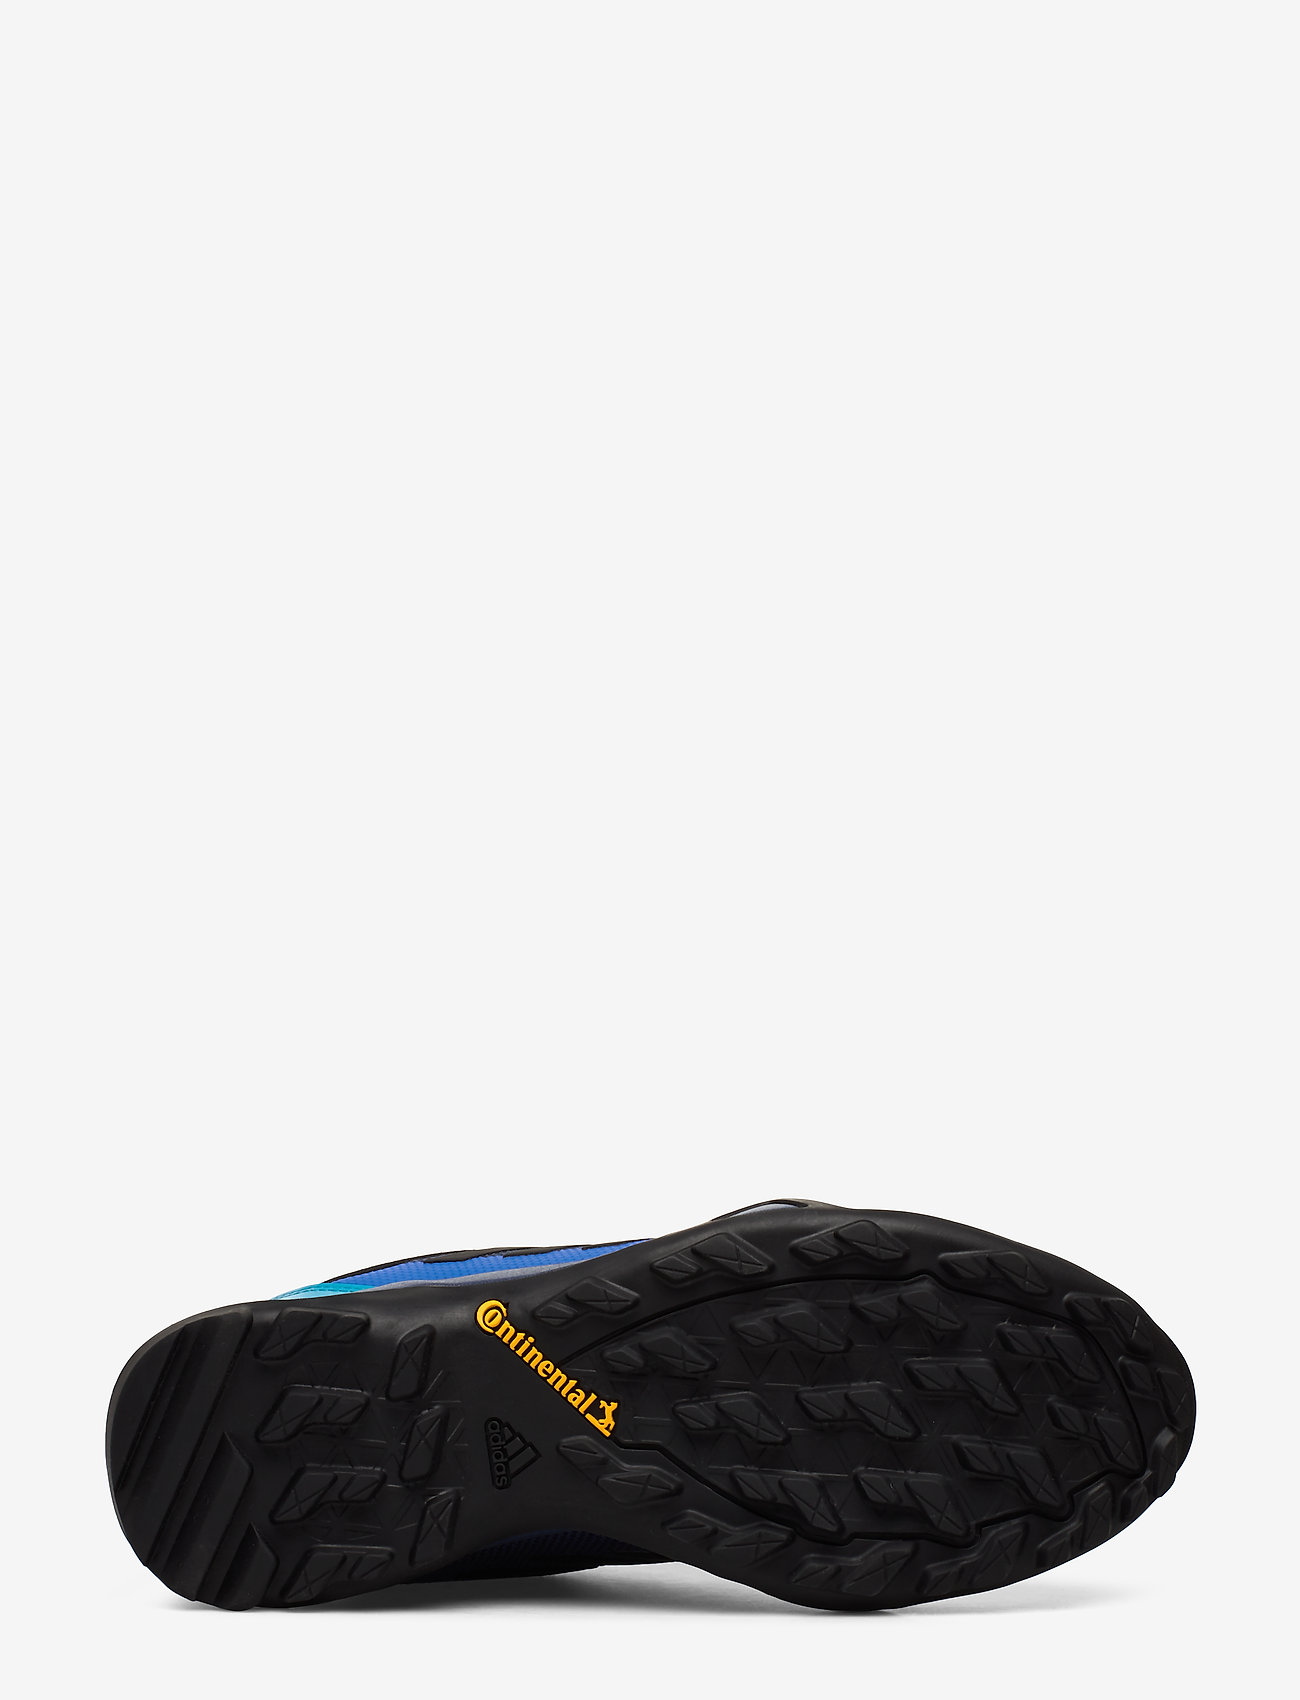 Terrex Ax3 Gtx (Cblack/cblack/shocya) - adidas Performance